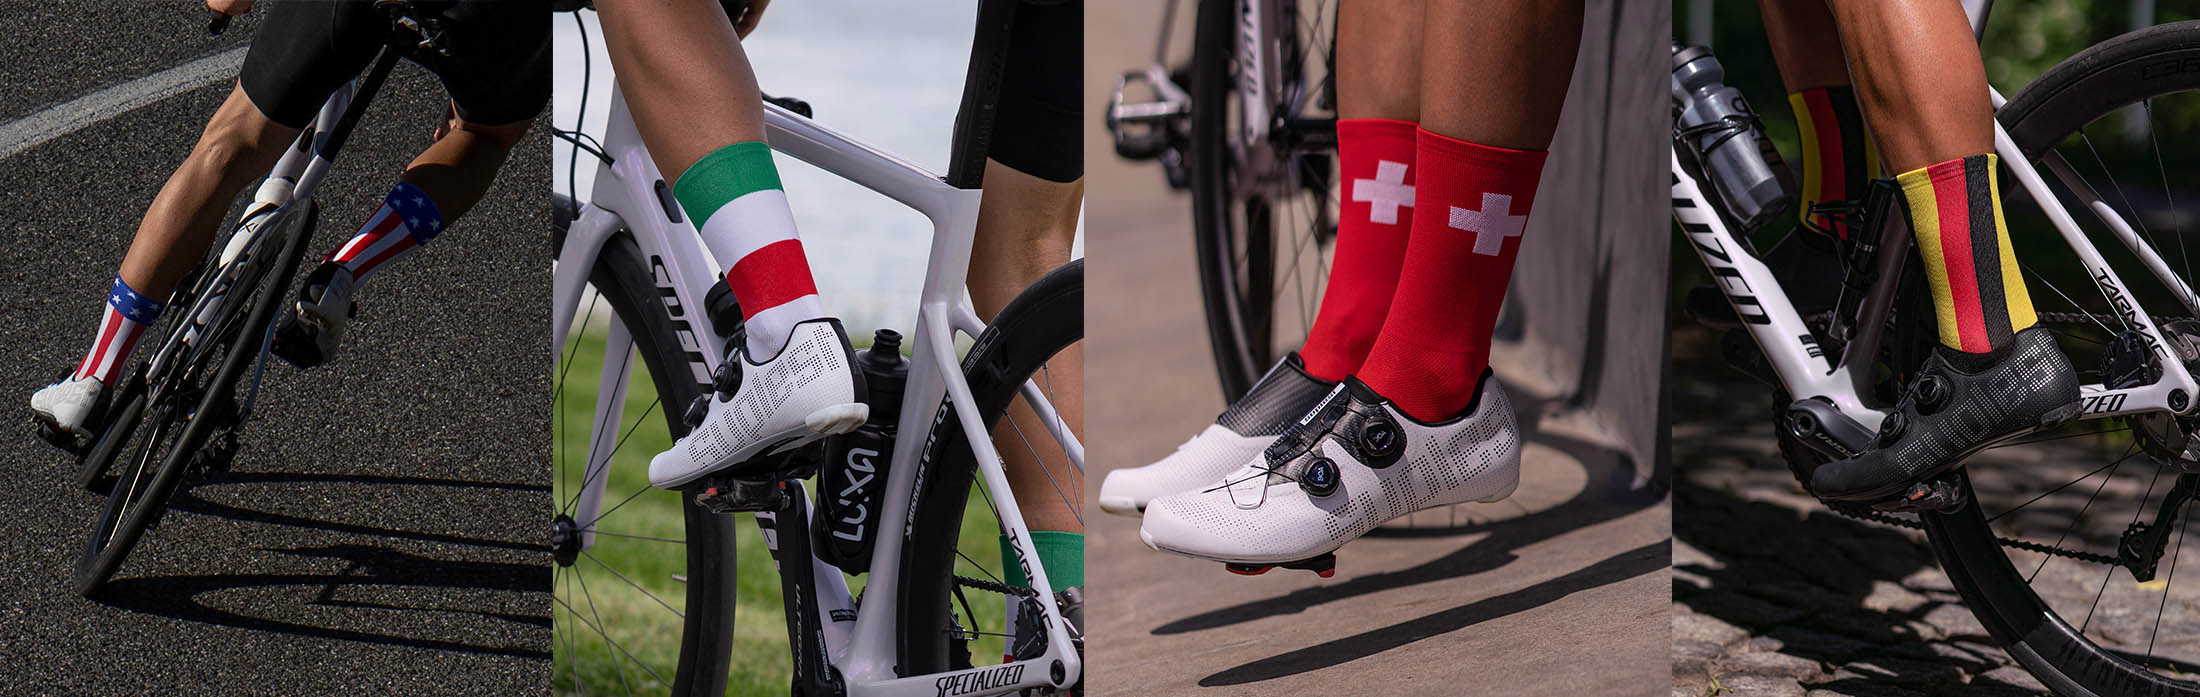 luxa cycling premium bib shorts and tights